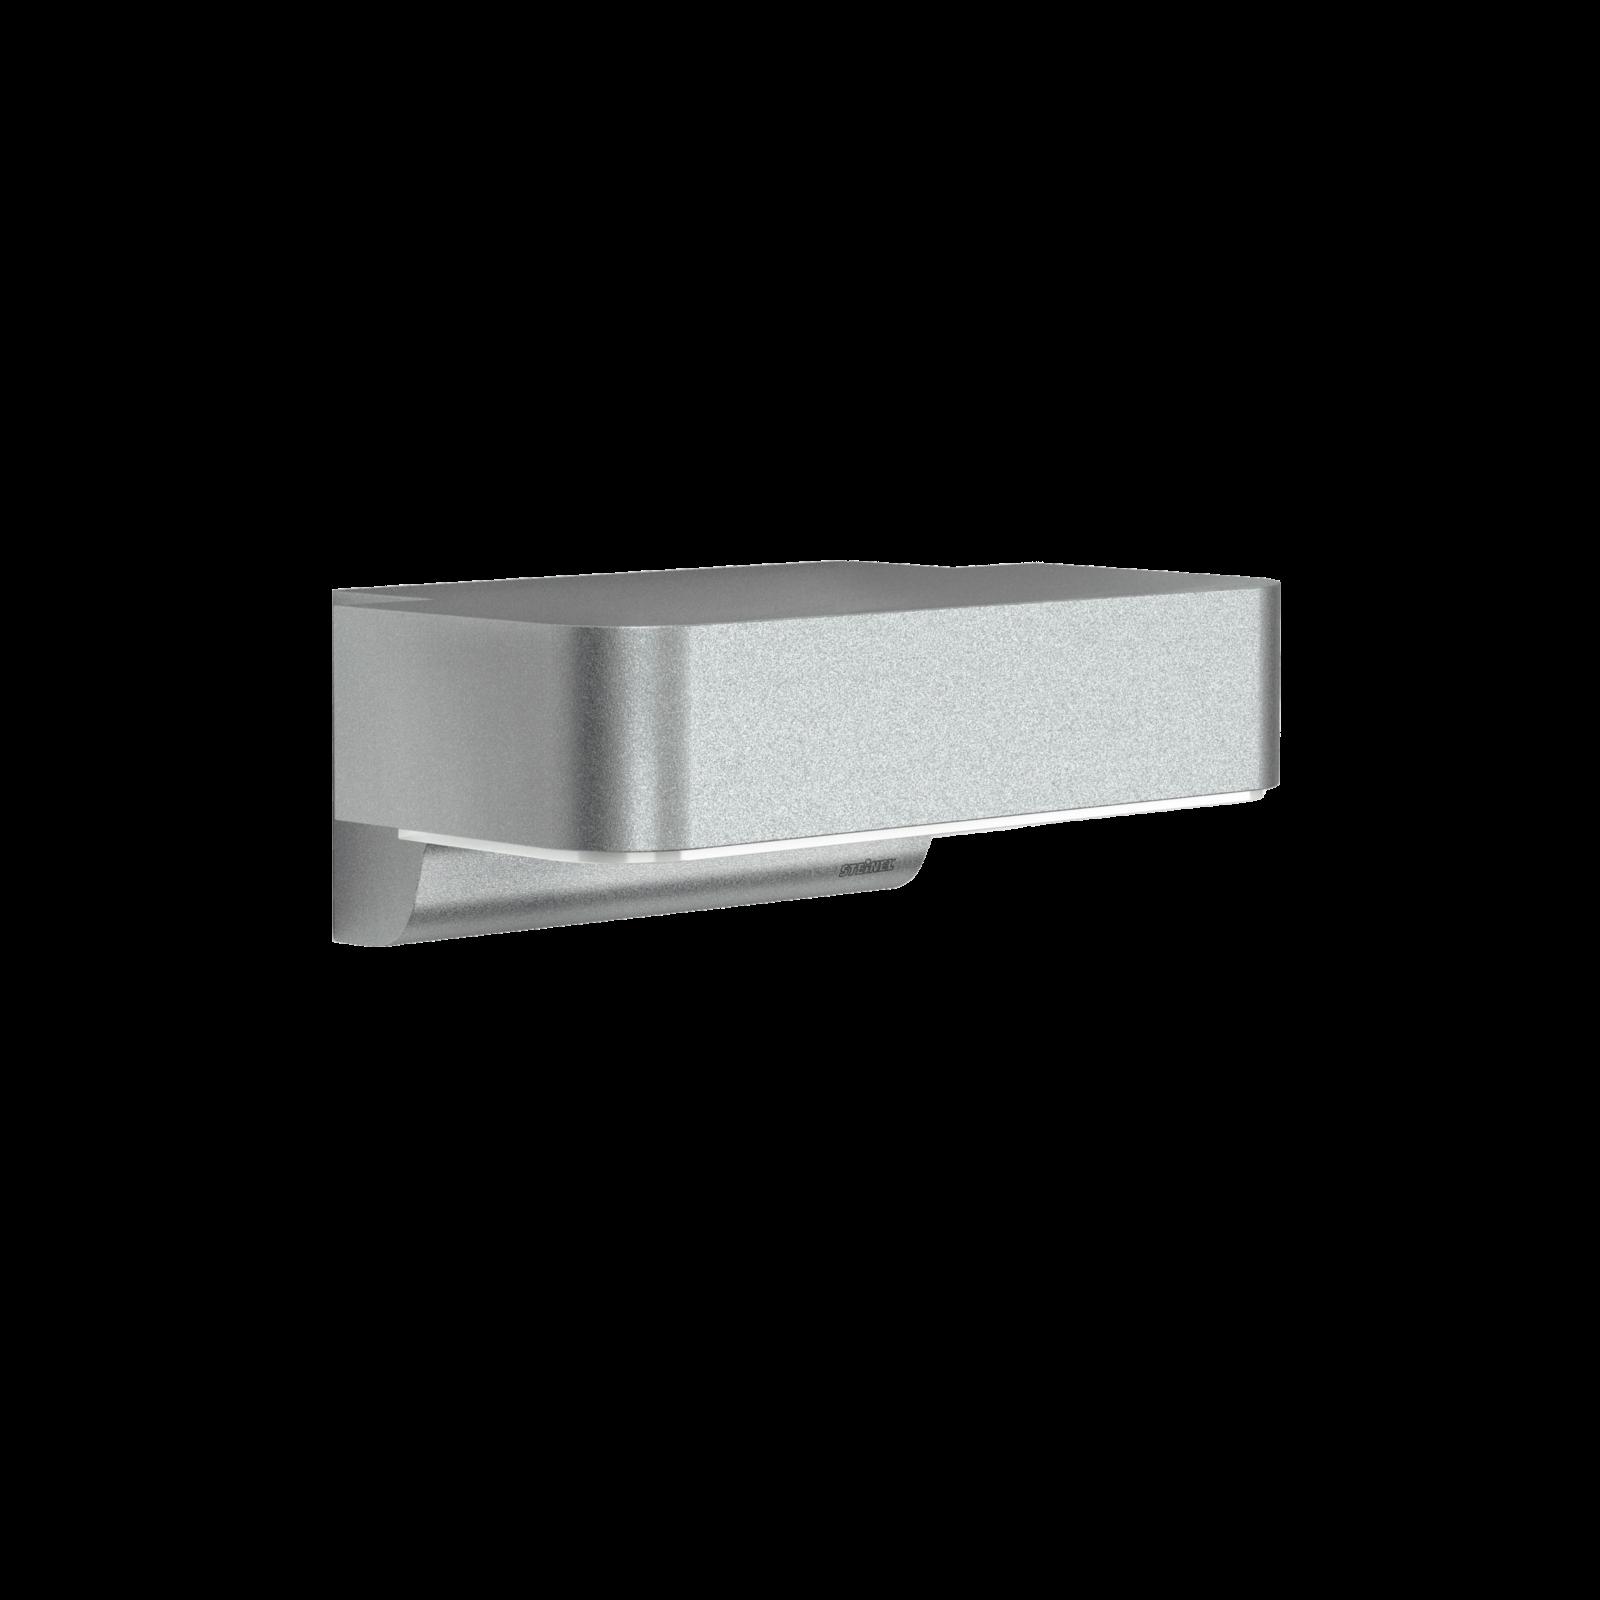 Steinel L 800 iHF Sensor-LED-Wandleuchte, Downlight